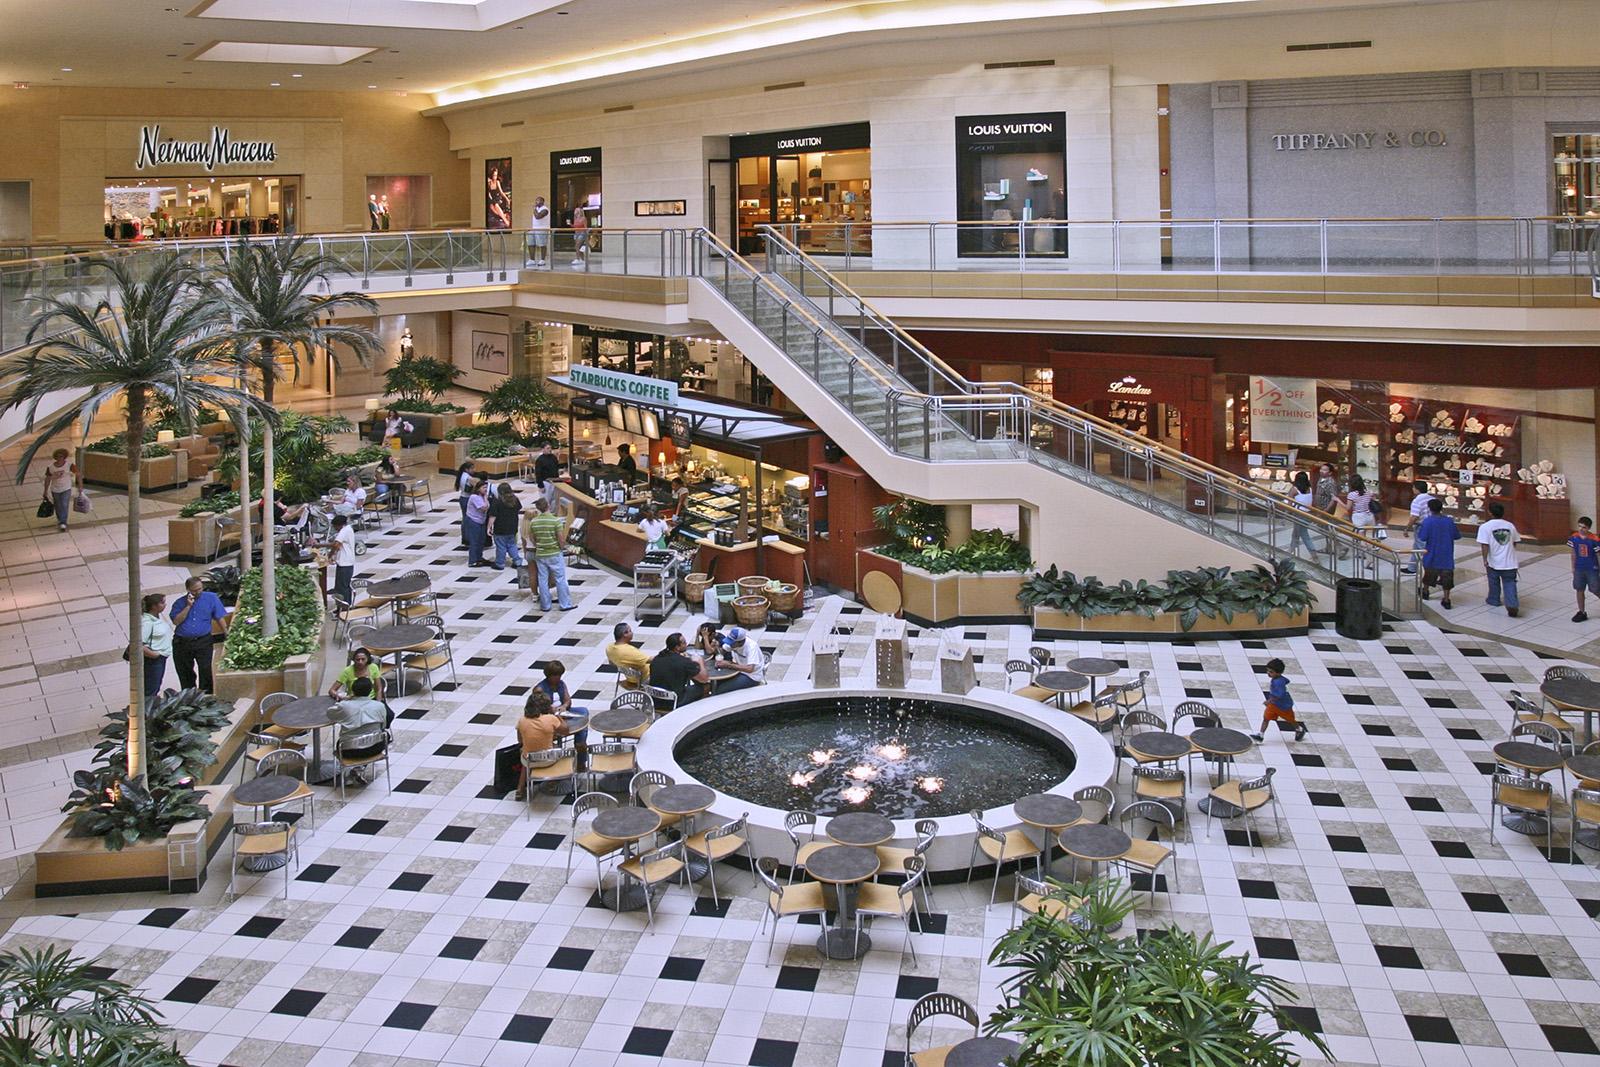 interntational plaza 03.jpg